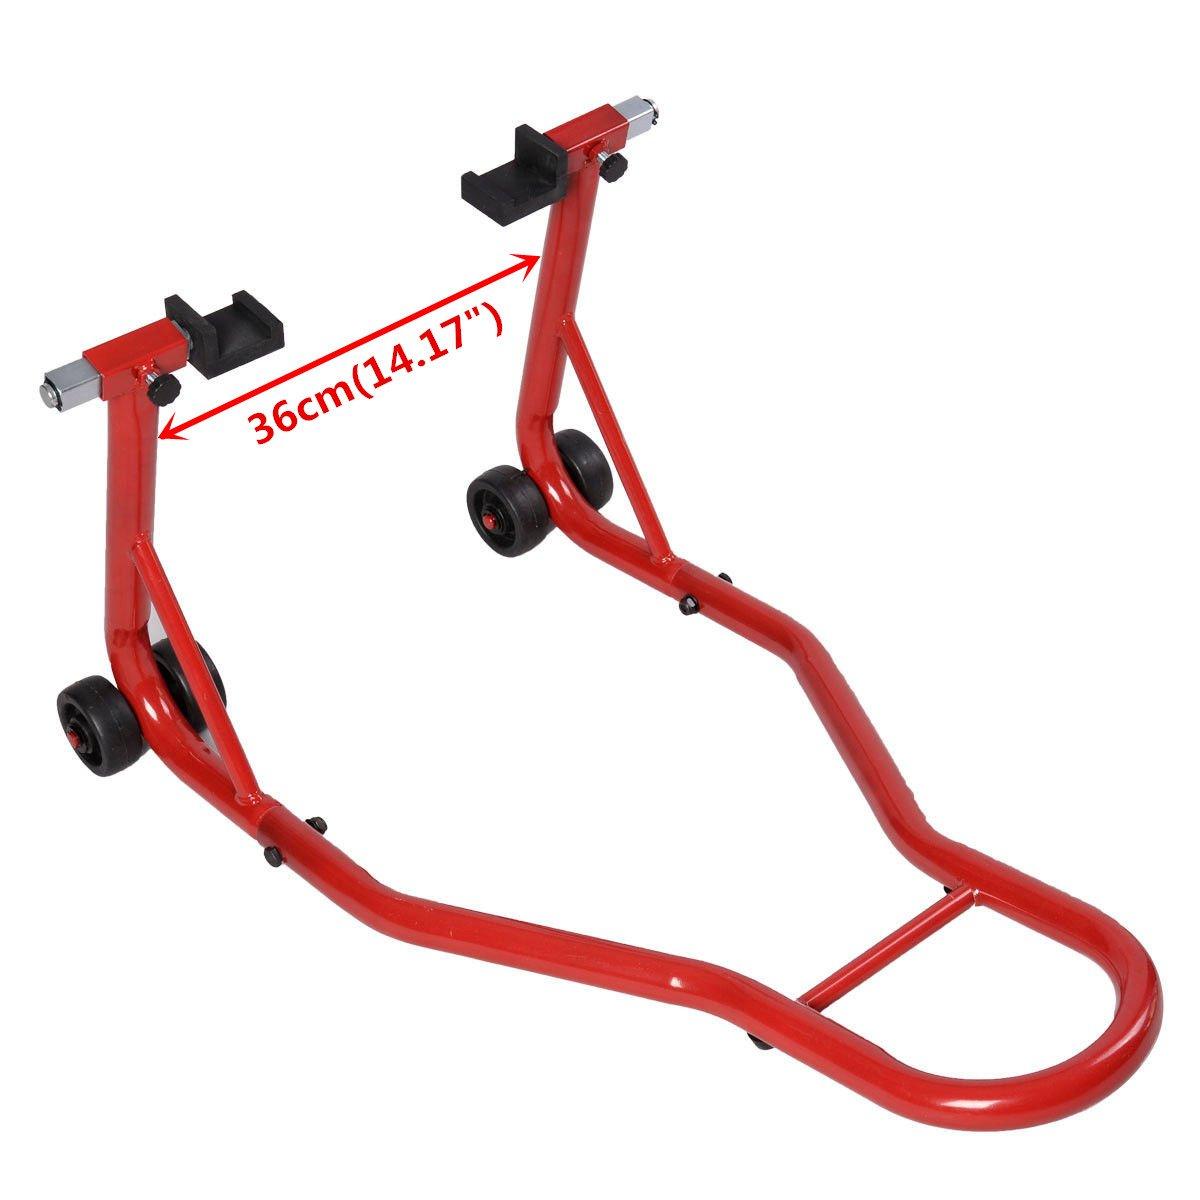 Safstar Motorcycle Stand Sport Bike Rear Forklift Rear Spoolift Paddock Swingarm Lift for Auto Bike Shop, Red